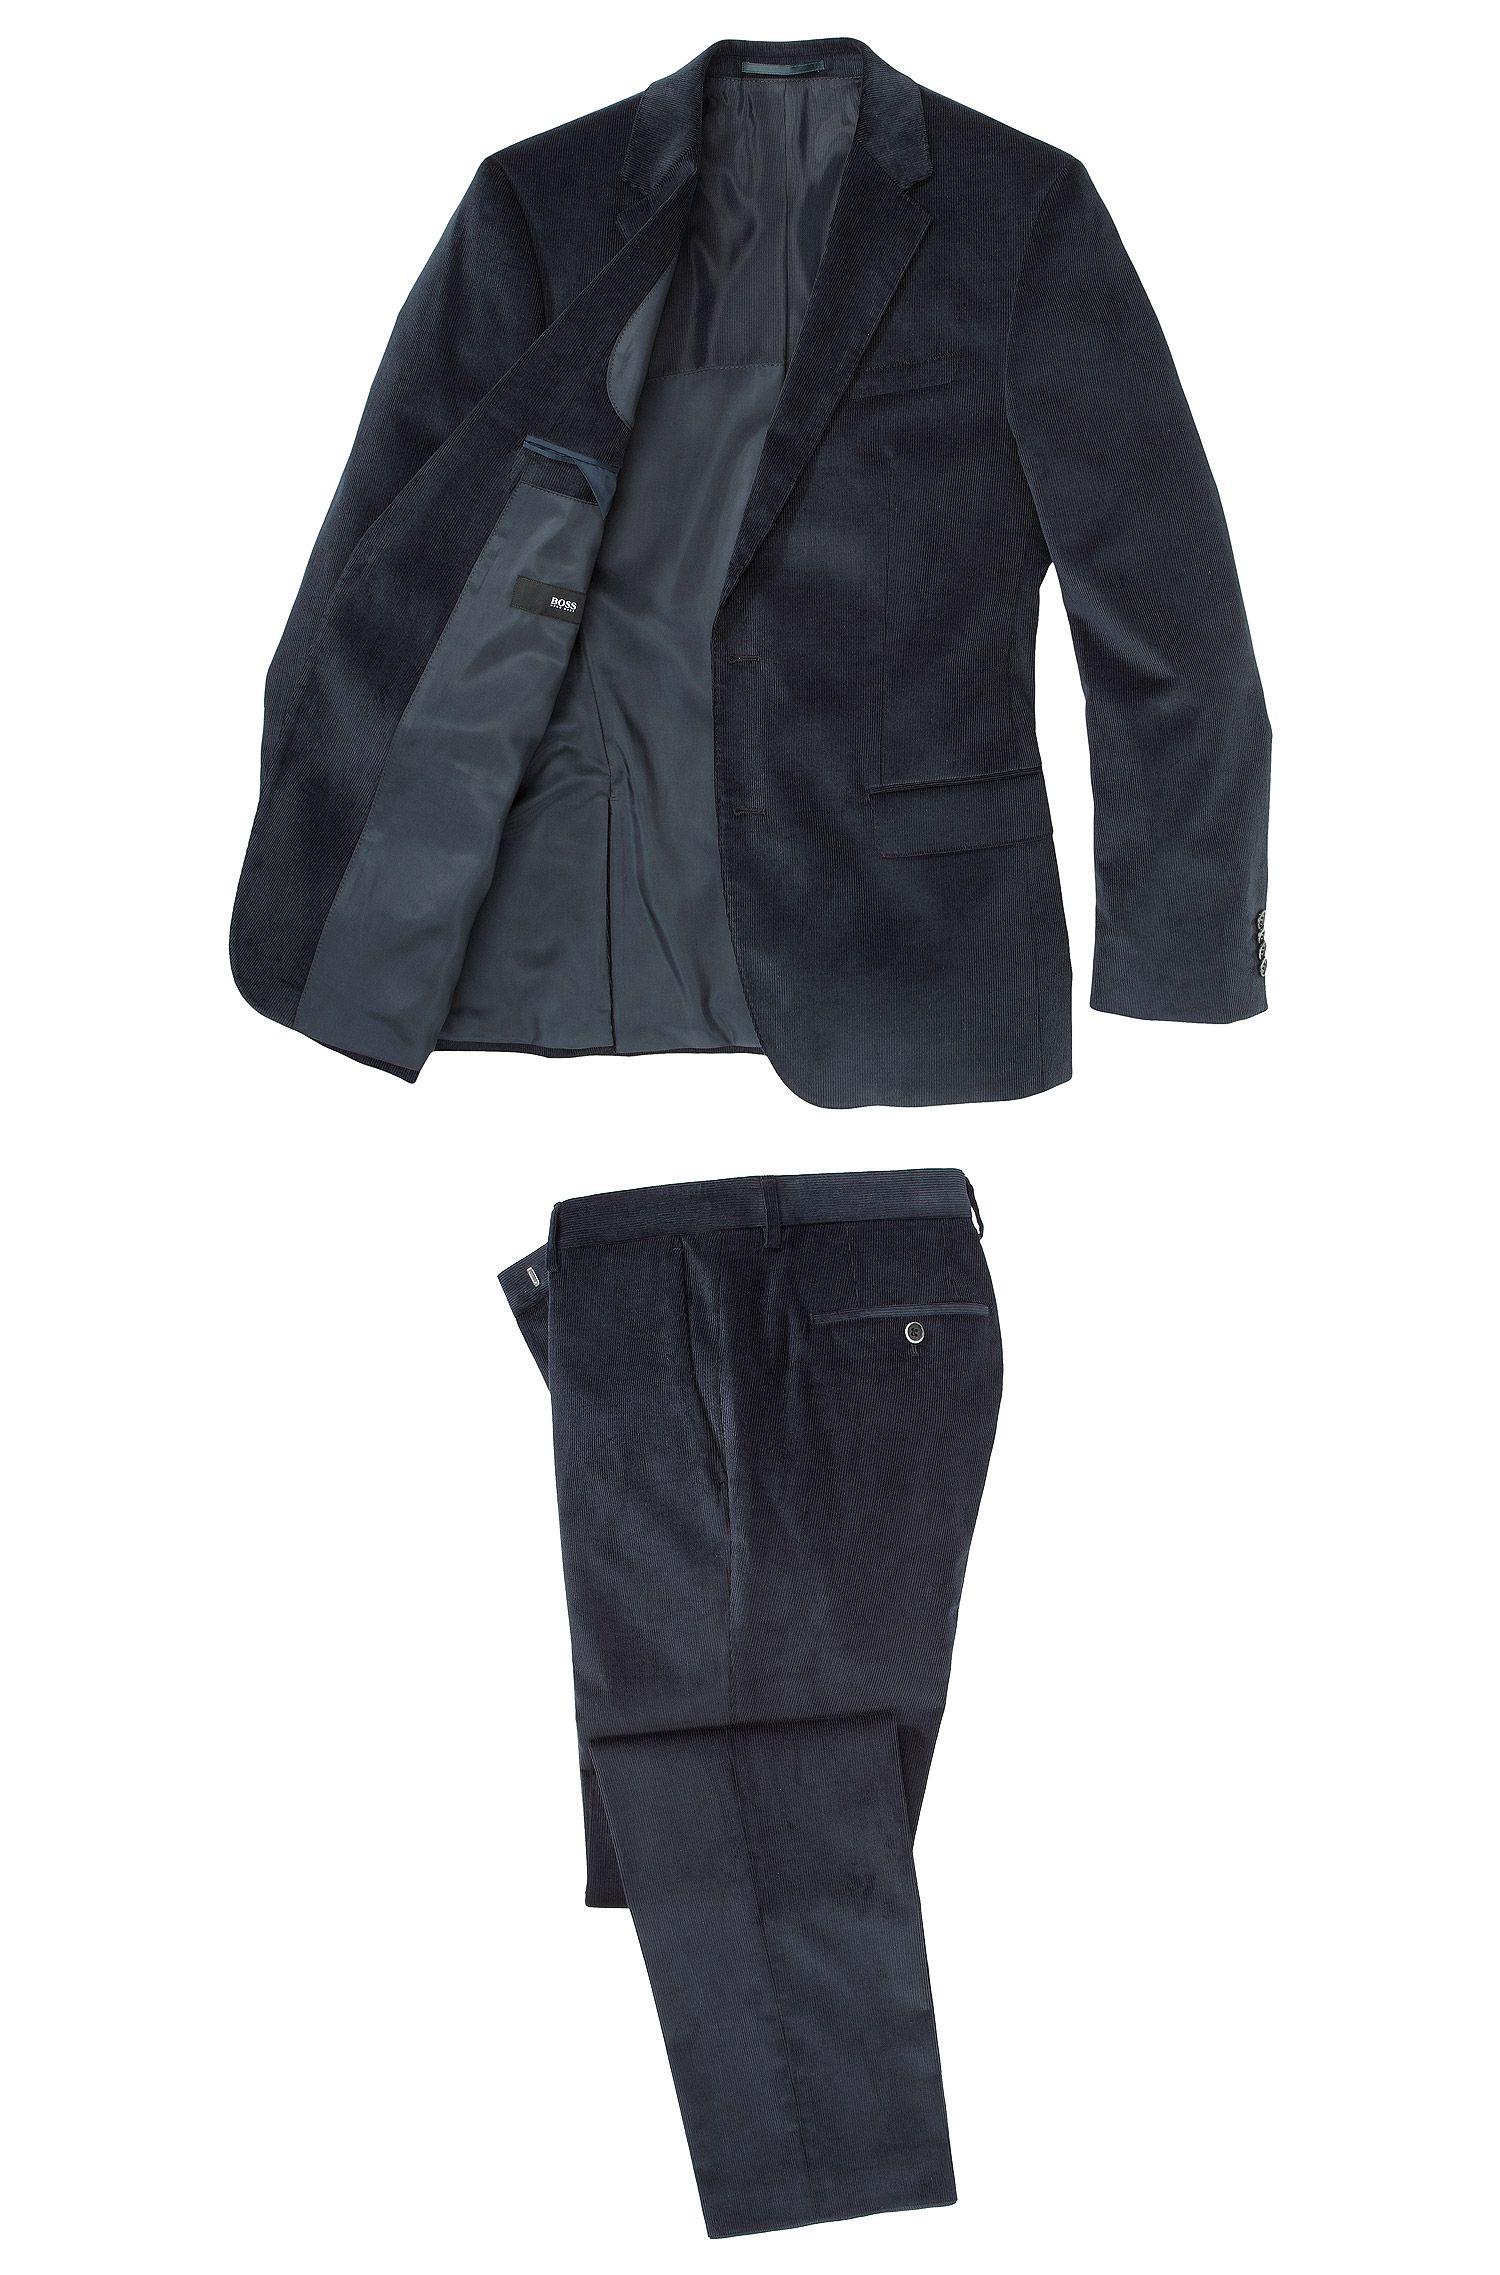 Slim-Fit Anzug ´Hedge2/Gense1` aus Cord